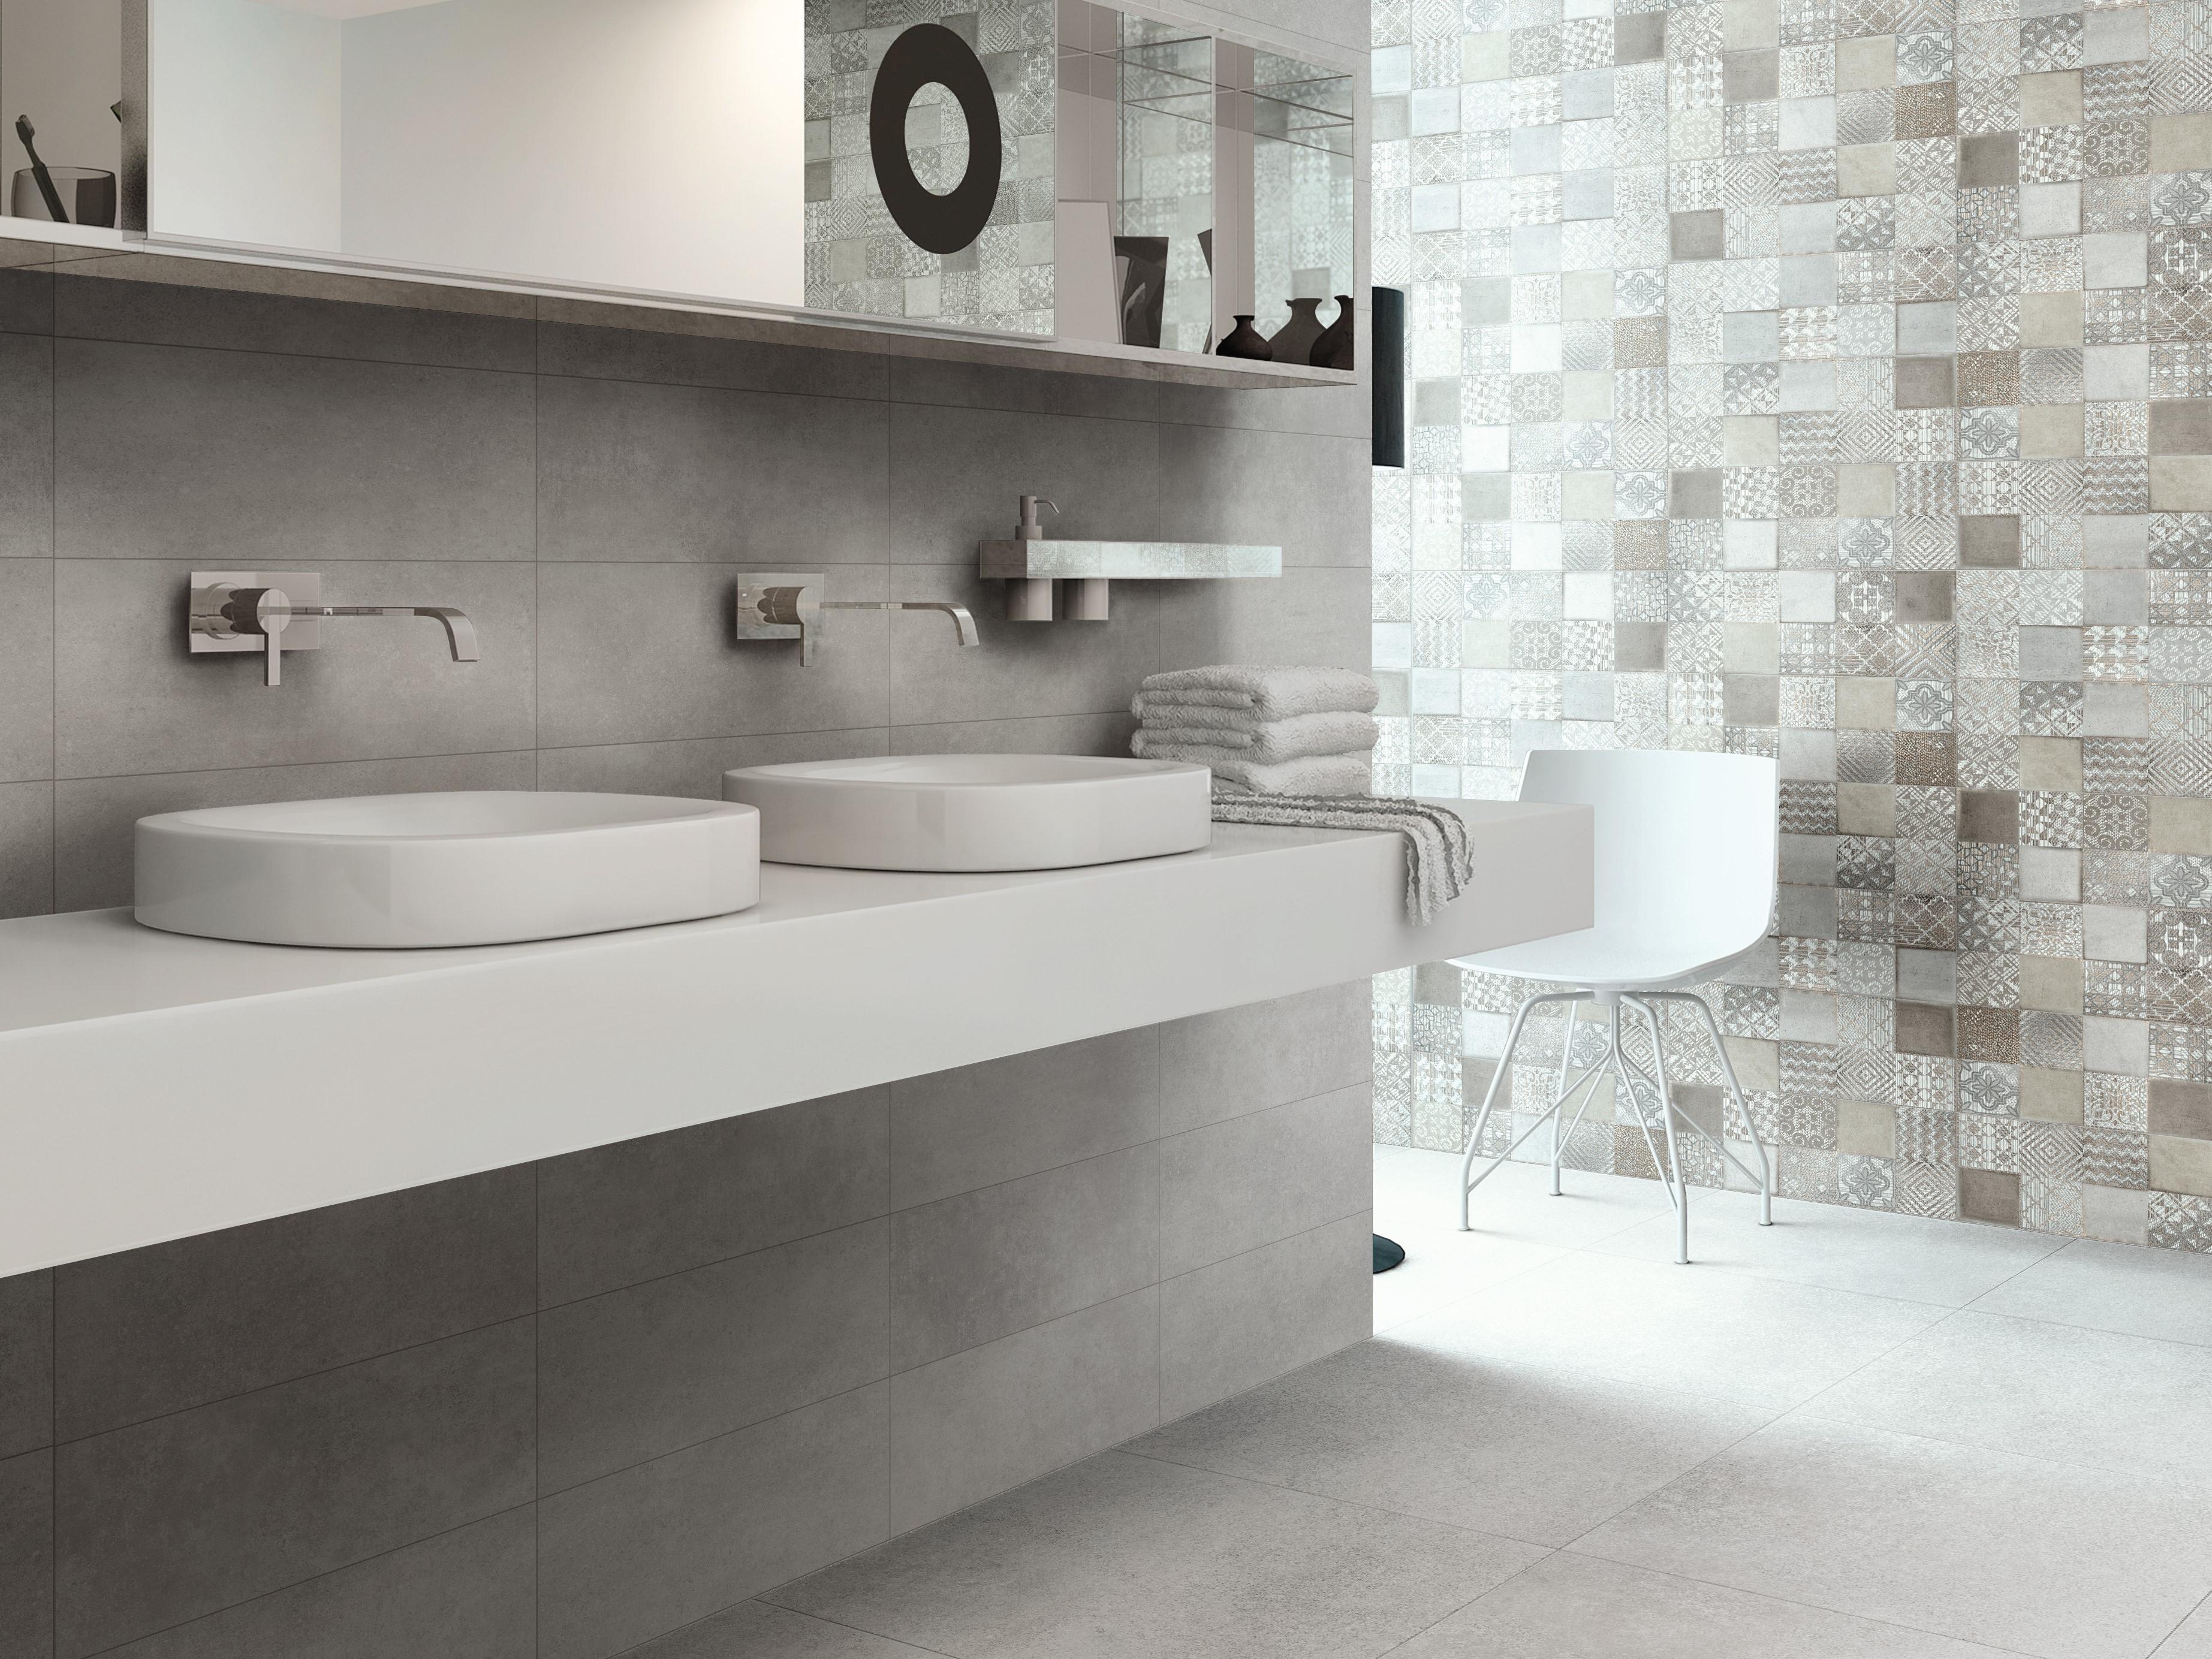 Select-Nebbia20x50-60x60-Dec-20x50-Bagno